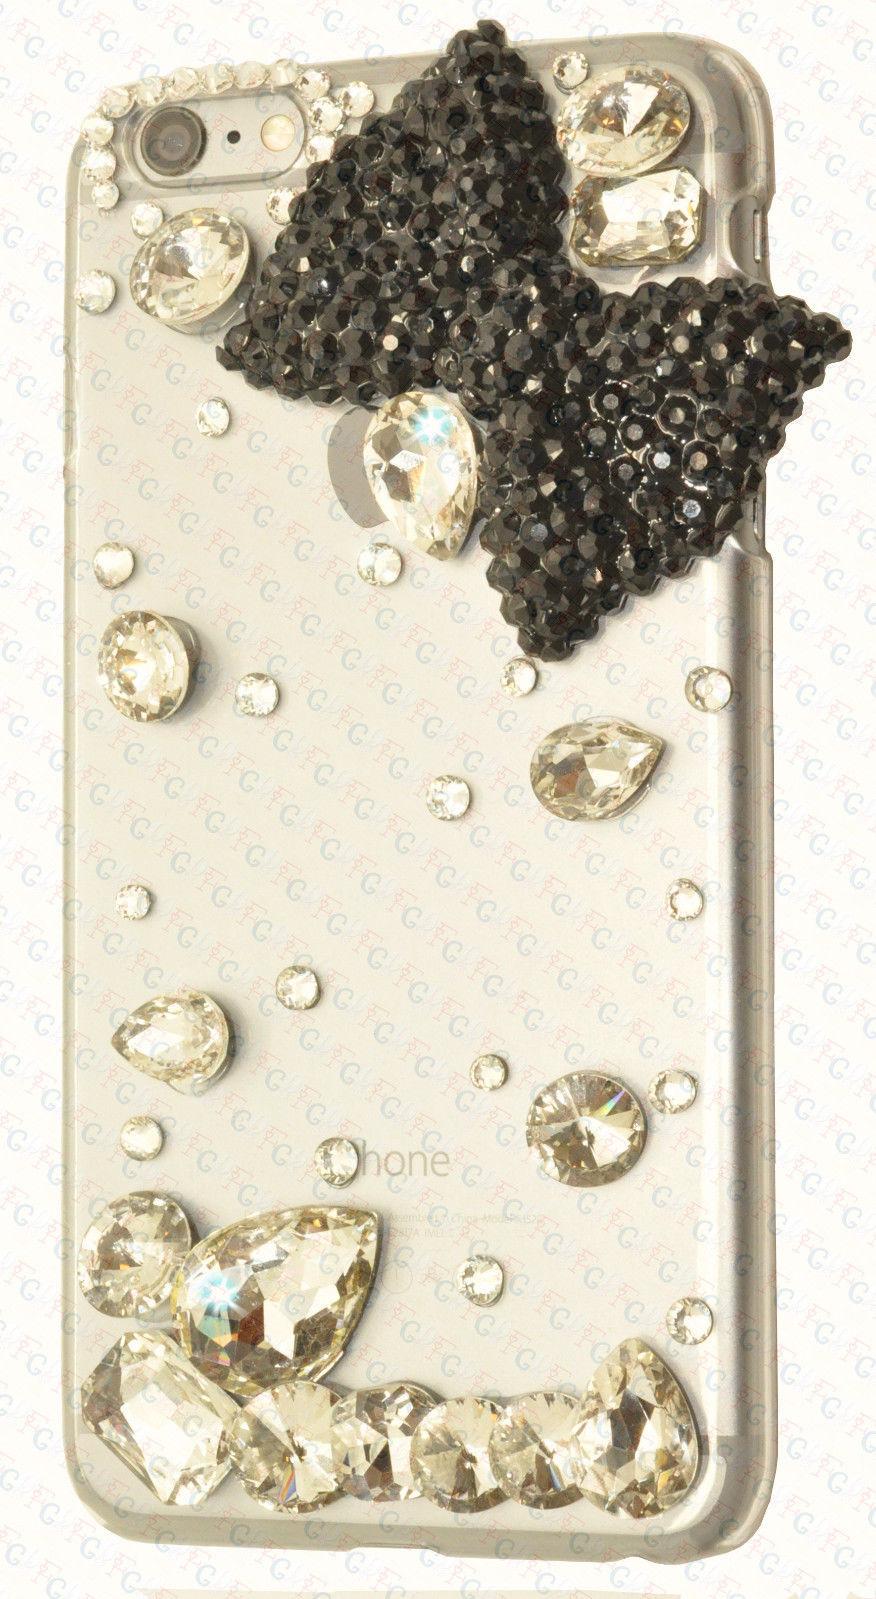 For iPhone 6 /Plus Luxury Diamond Crystal Bowtie Clear Case Black Rhinestone 4.7